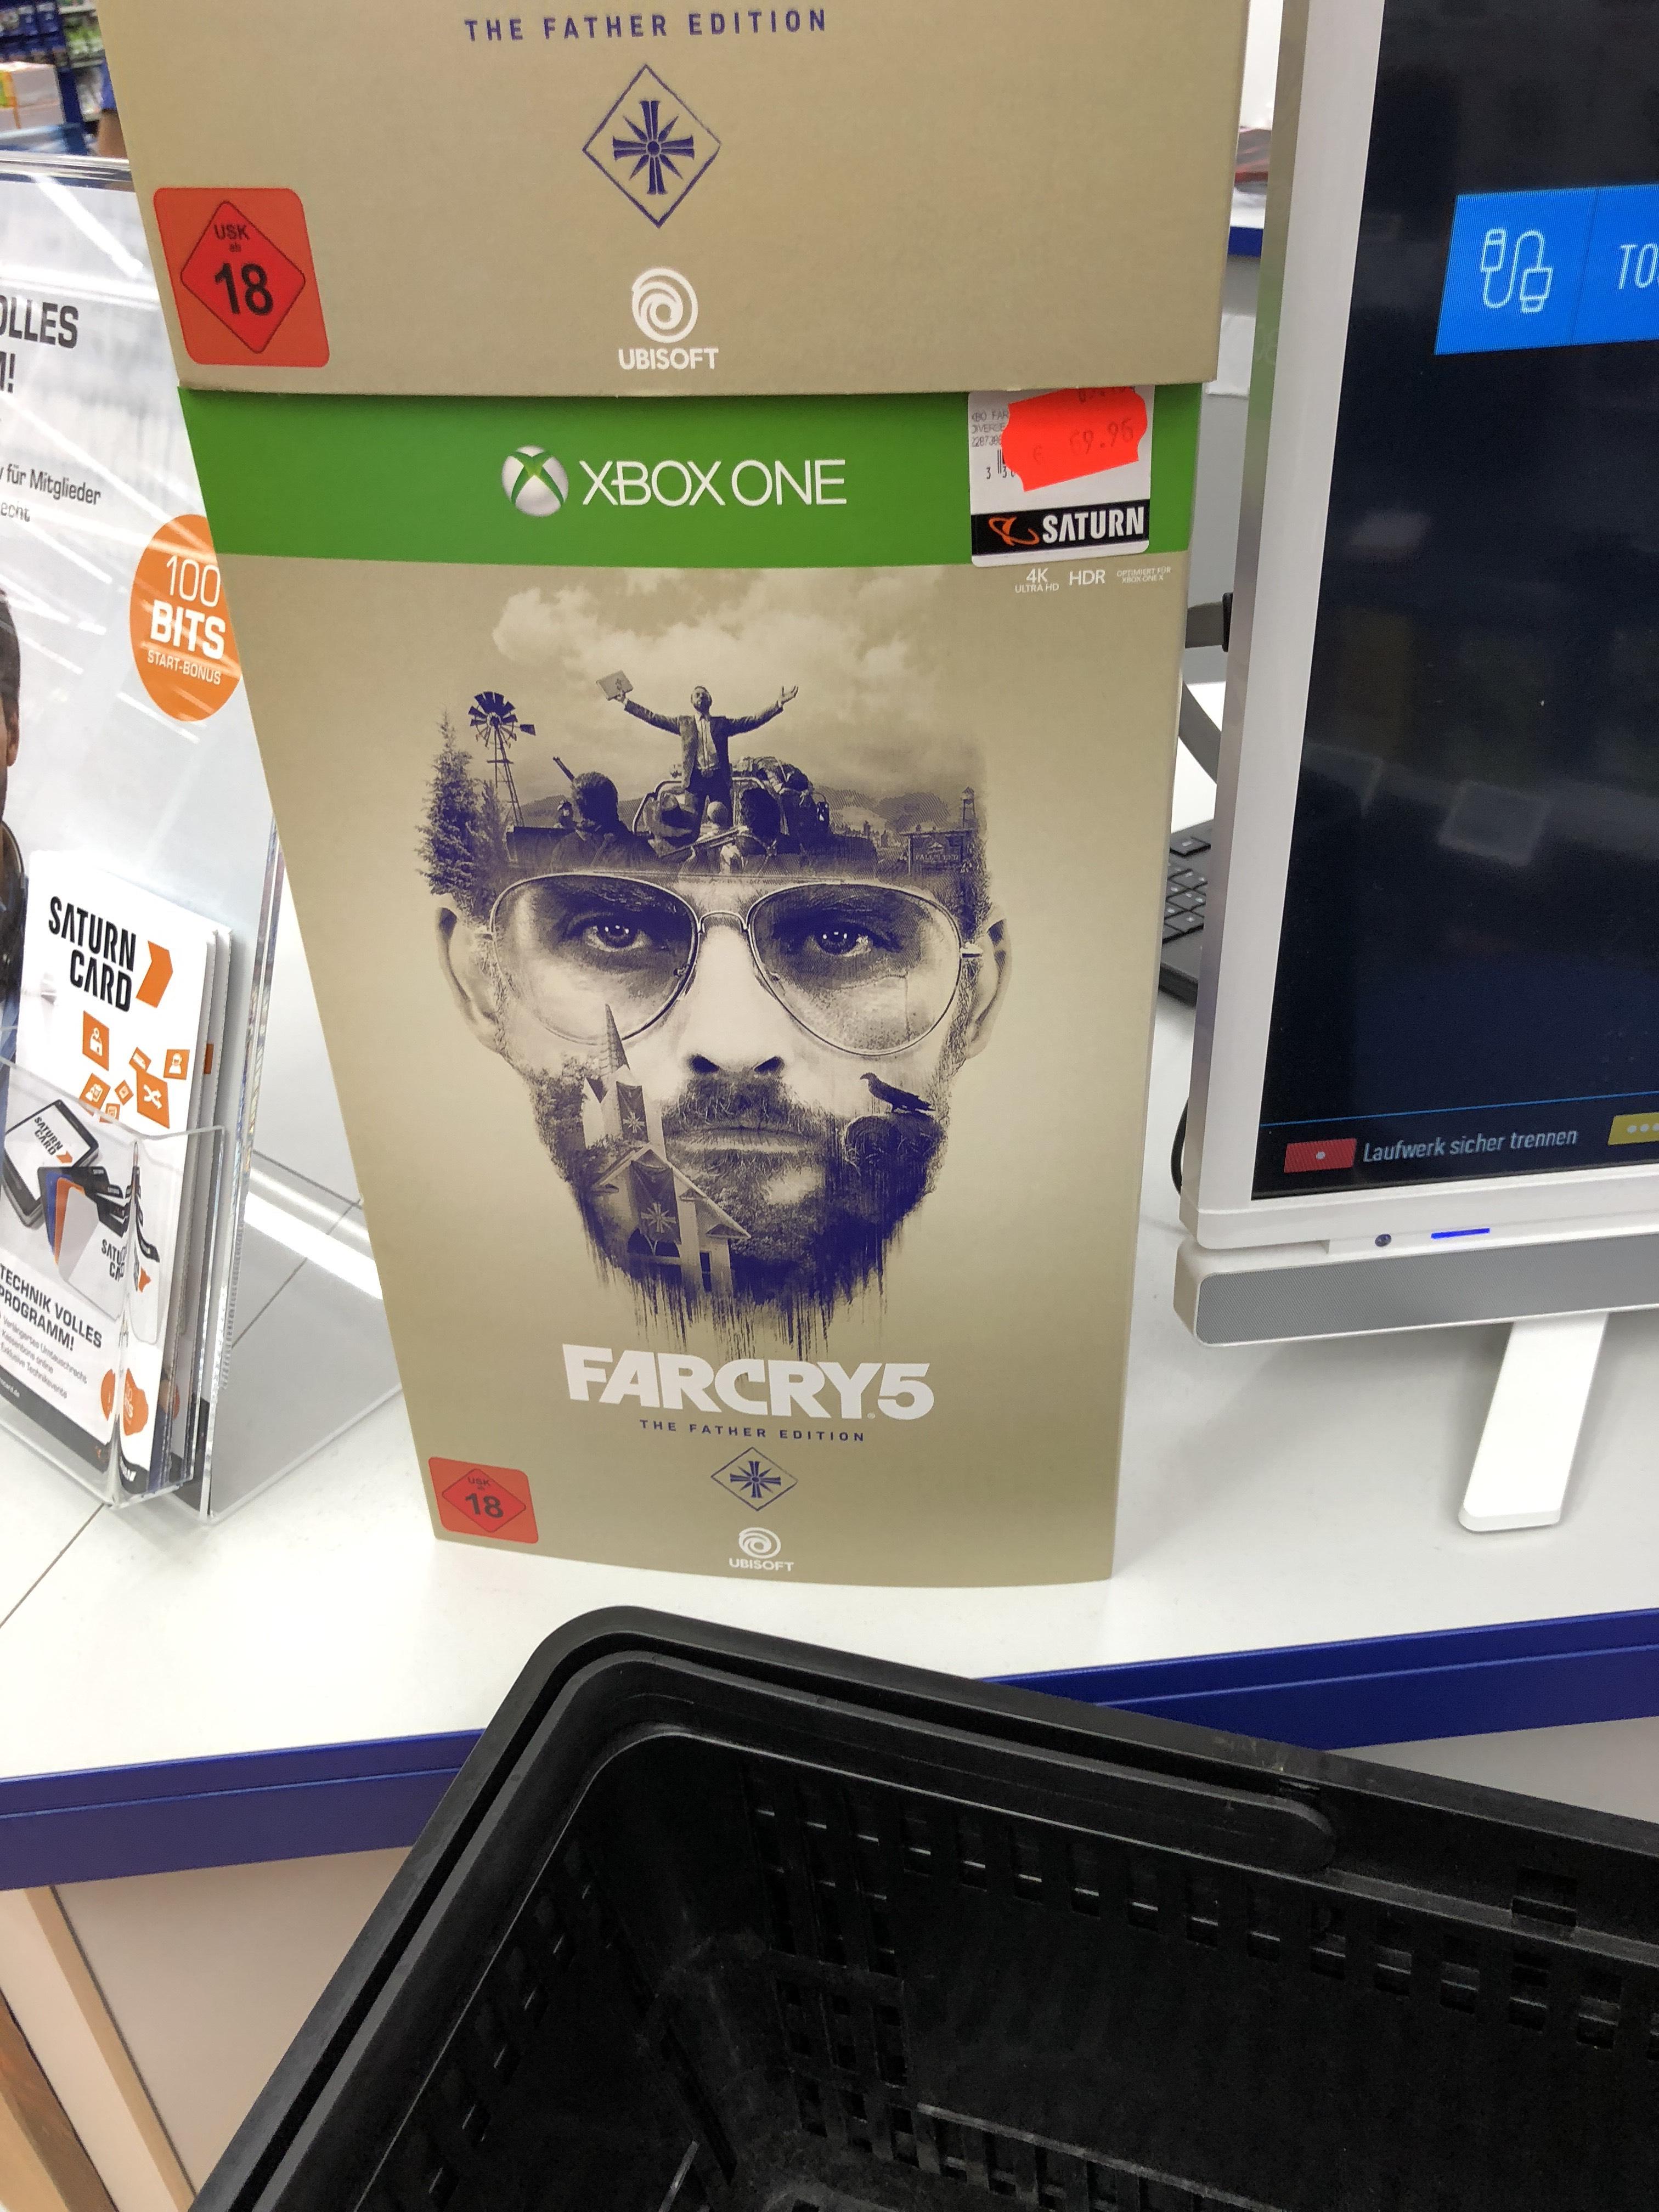 Far Cry 5 - The Father Edition / XBOX ONE / Saturn Dortmund City /LOKAL